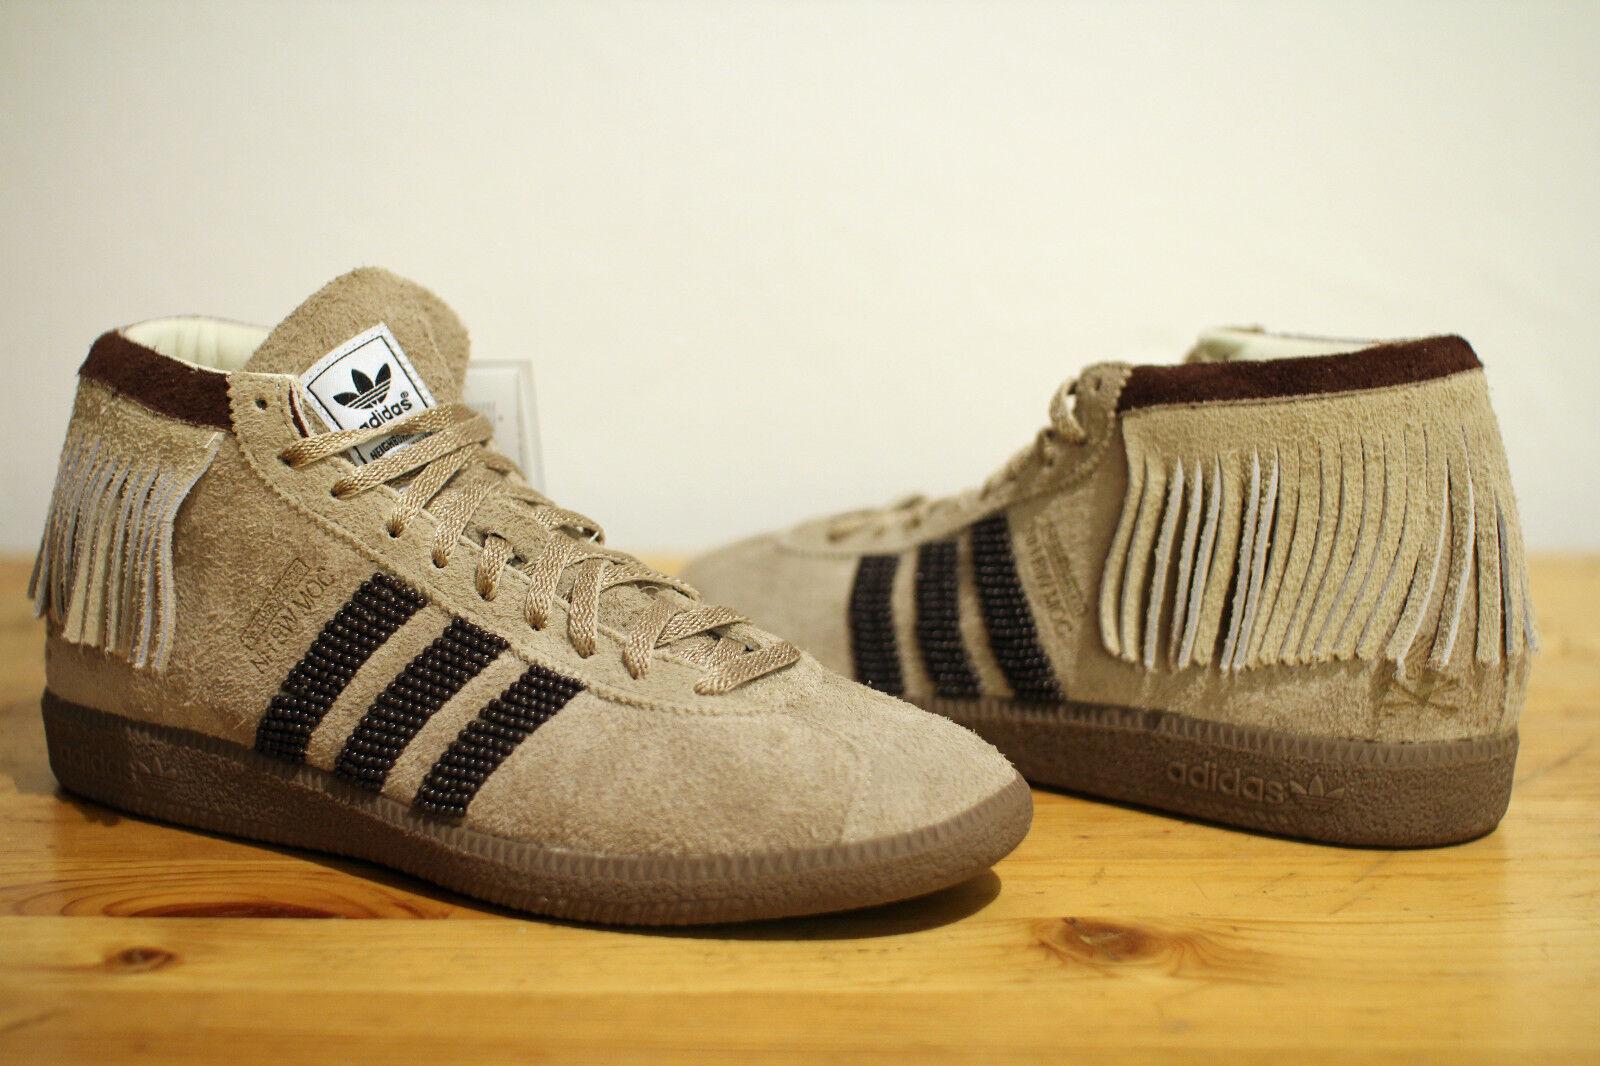 Adidas X Neighborhood BW Moc Braun Gr. 42,43,44,45 NEU & OVP